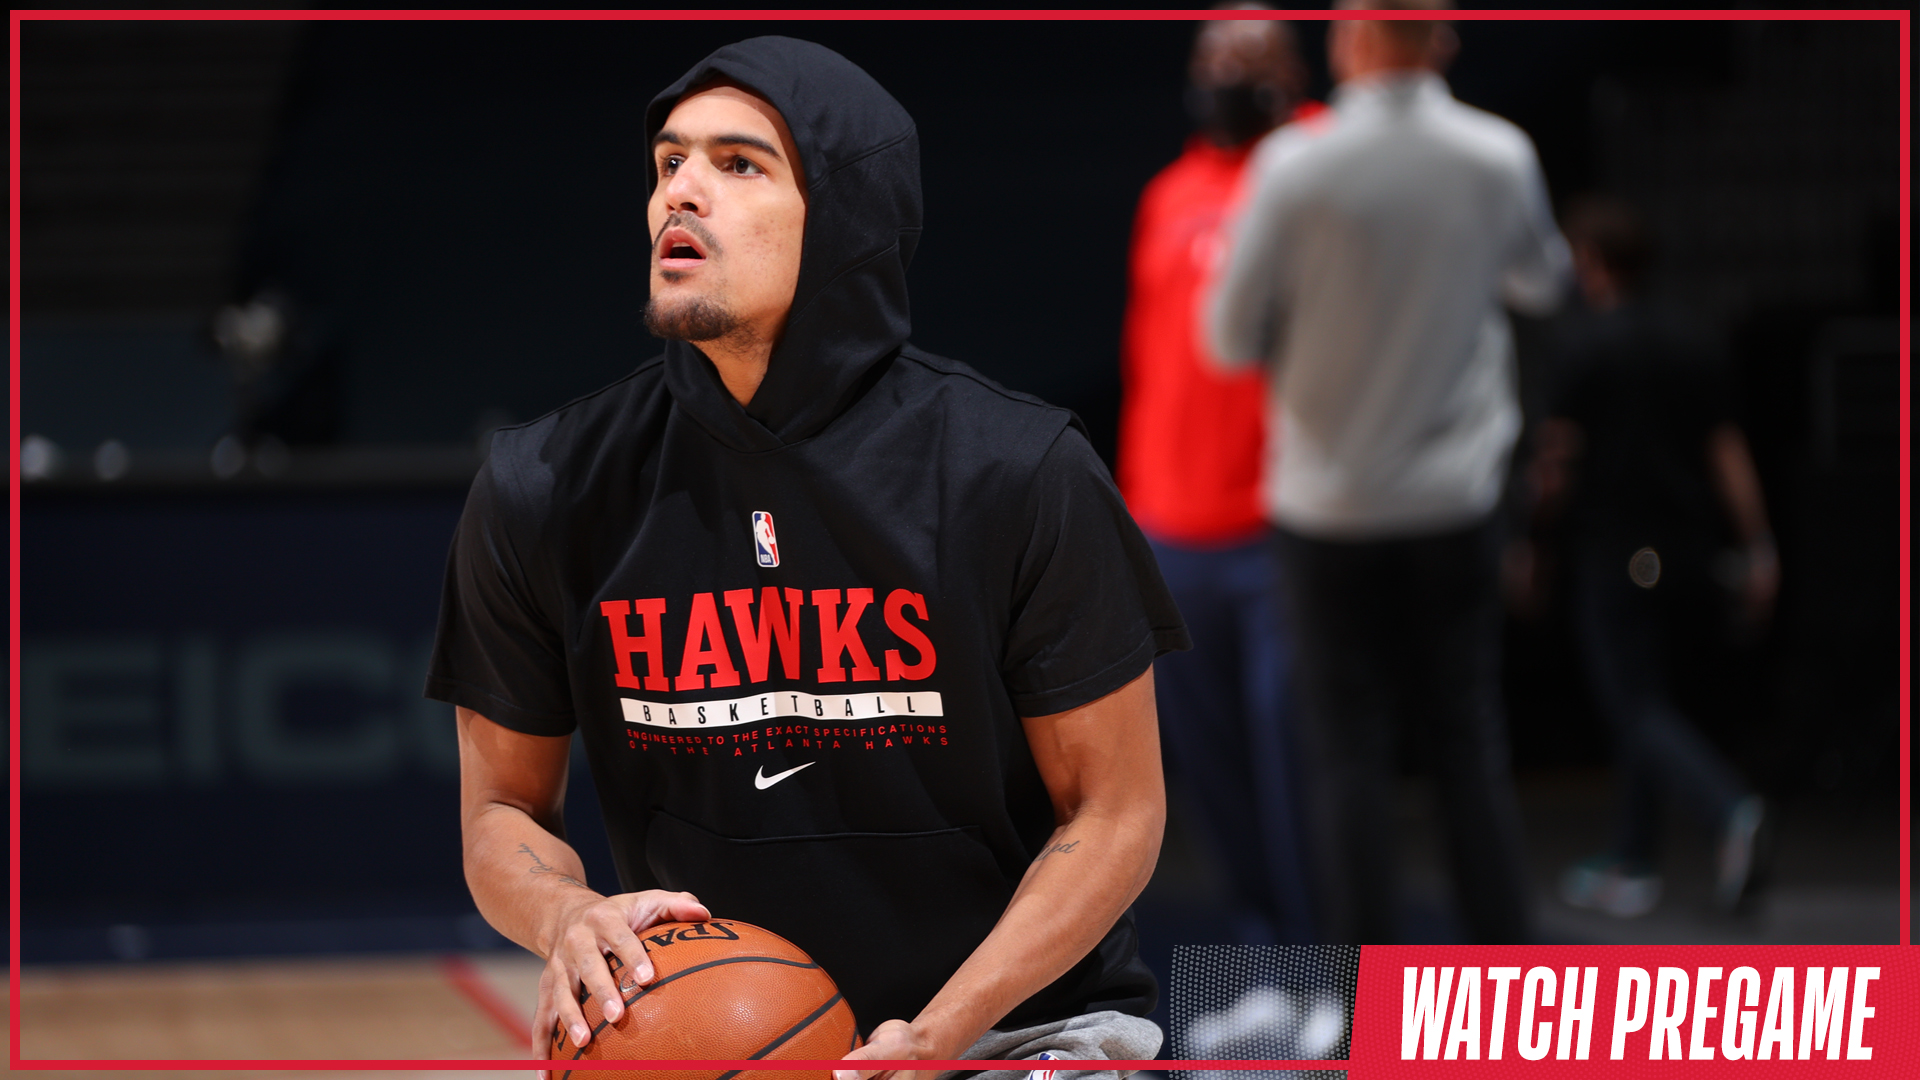 Watch Free: Hawks vs. Heat Pregame